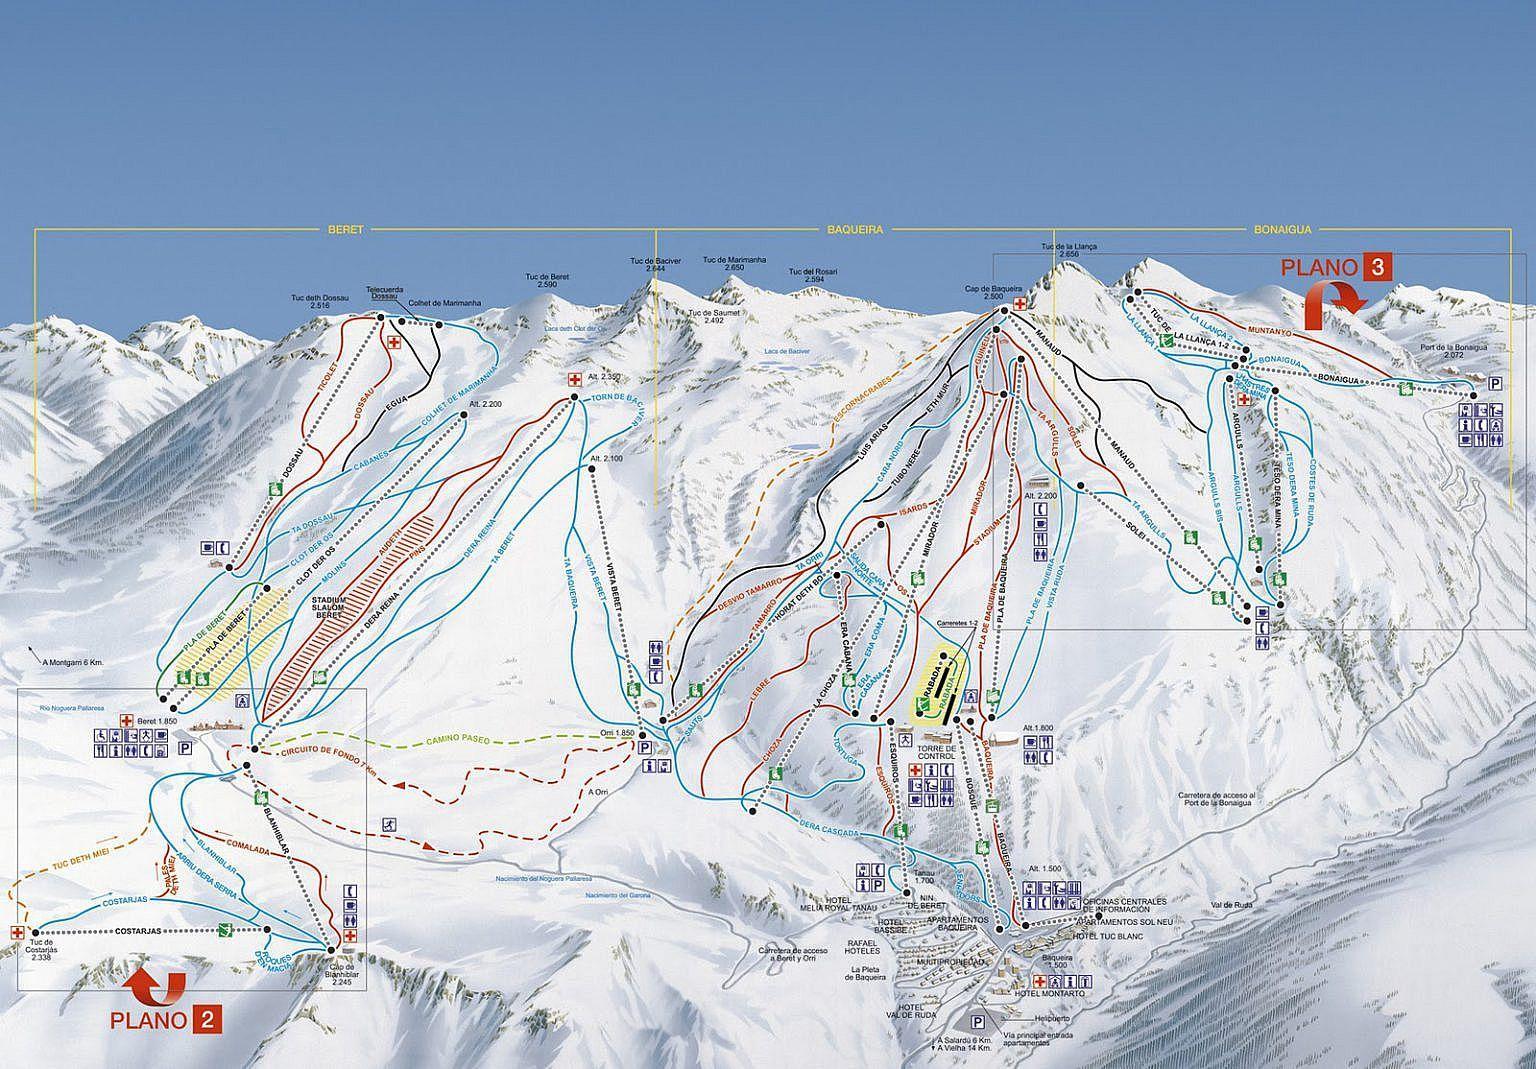 Esqui Baqueira Beret